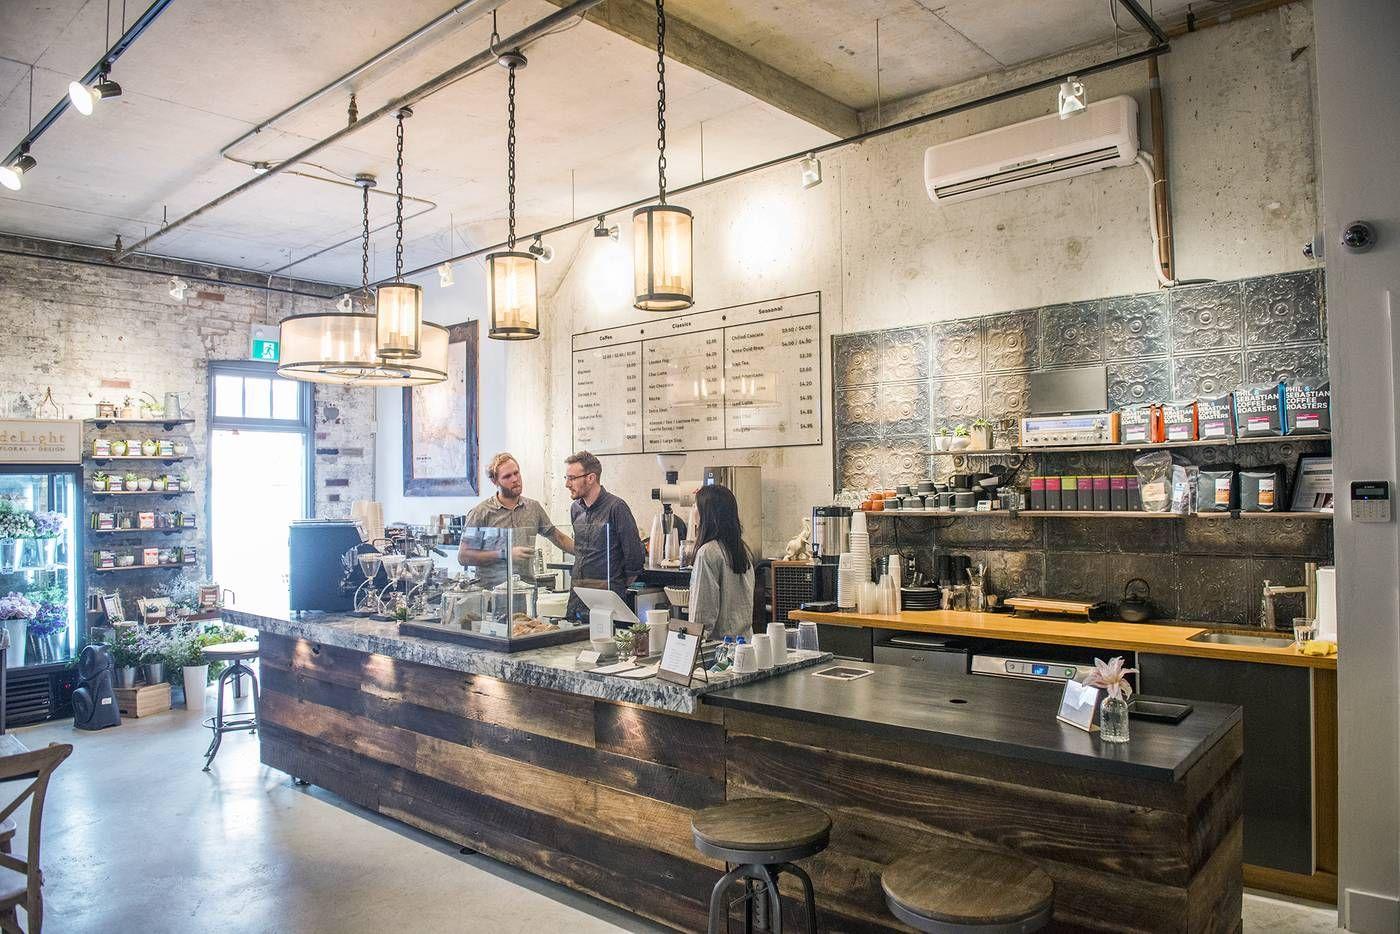 Toronto Has An Abundance Of Indie Coffee Shops Scattered Across Various Neighbourhoods But W Cafe Interior Design Coffee Shops Interior Bar Restaurant Interior